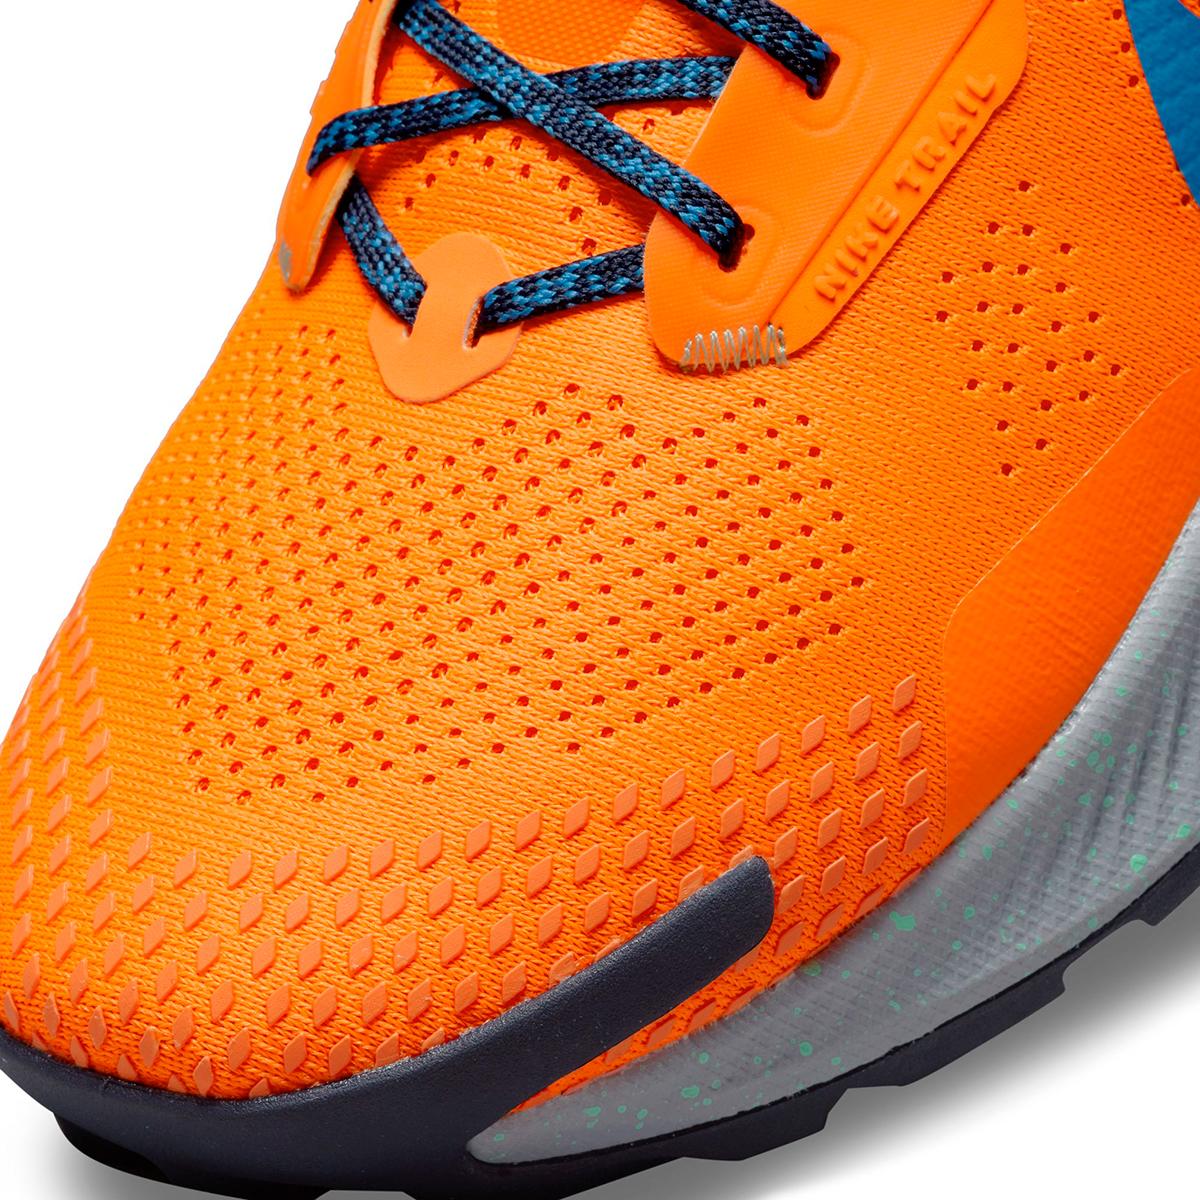 Men's Nike Pegasus Trail 3 Trail Running Shoe - Color: Total Orange/Signal Blue/Wolf Grey - Size: 6 - Width: Regular, Total Orange/Signal Blue/Wolf Grey, large, image 4